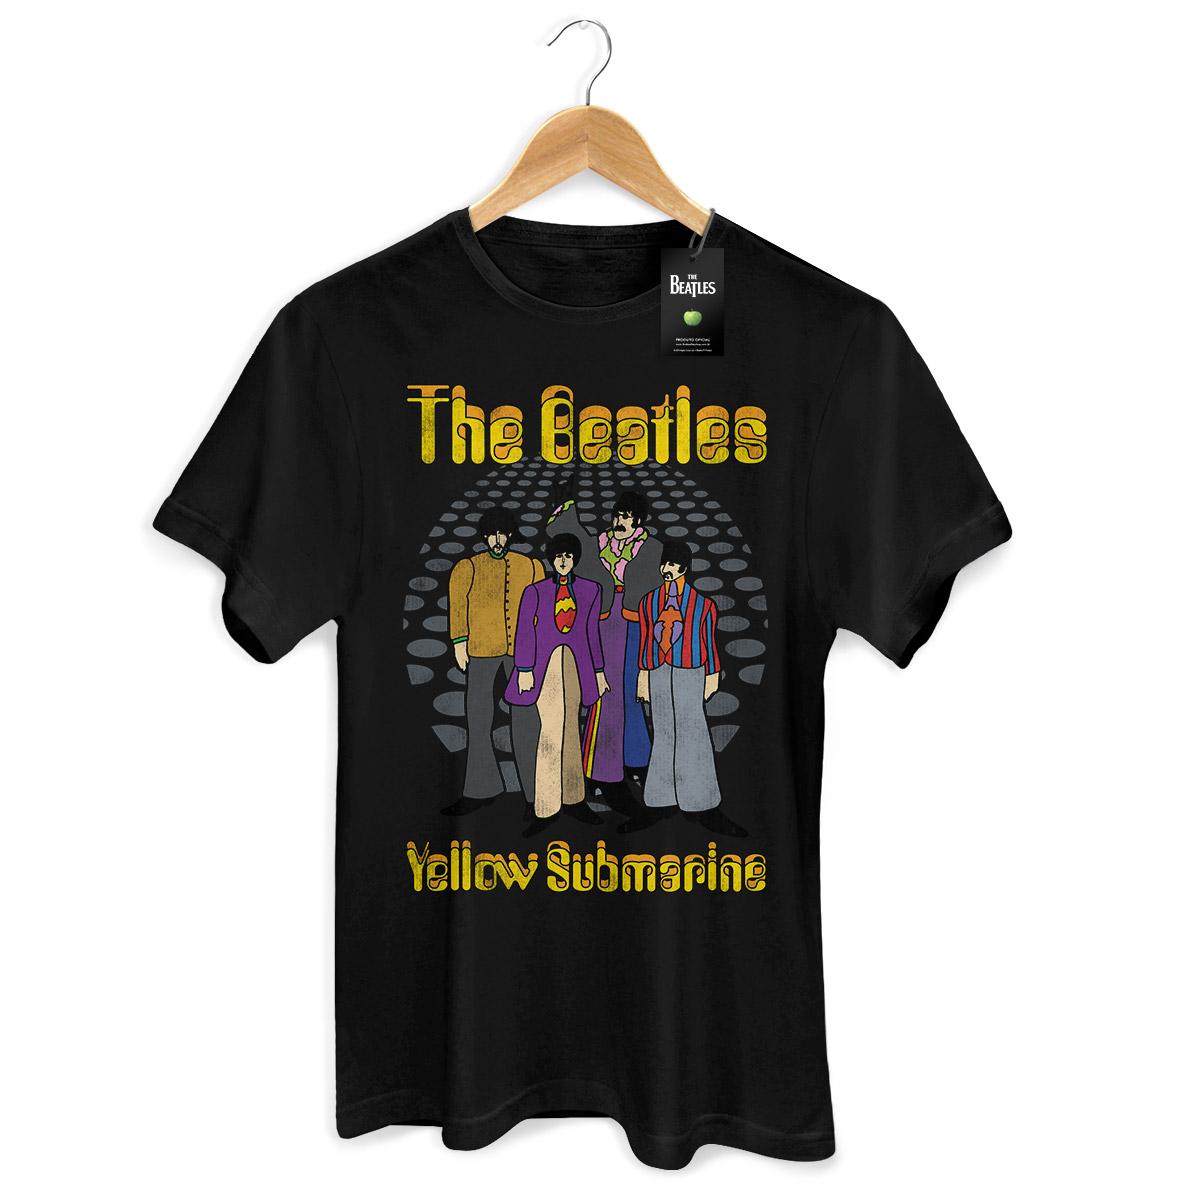 Camiseta Exclusiva The Beatles Yellow Submarine